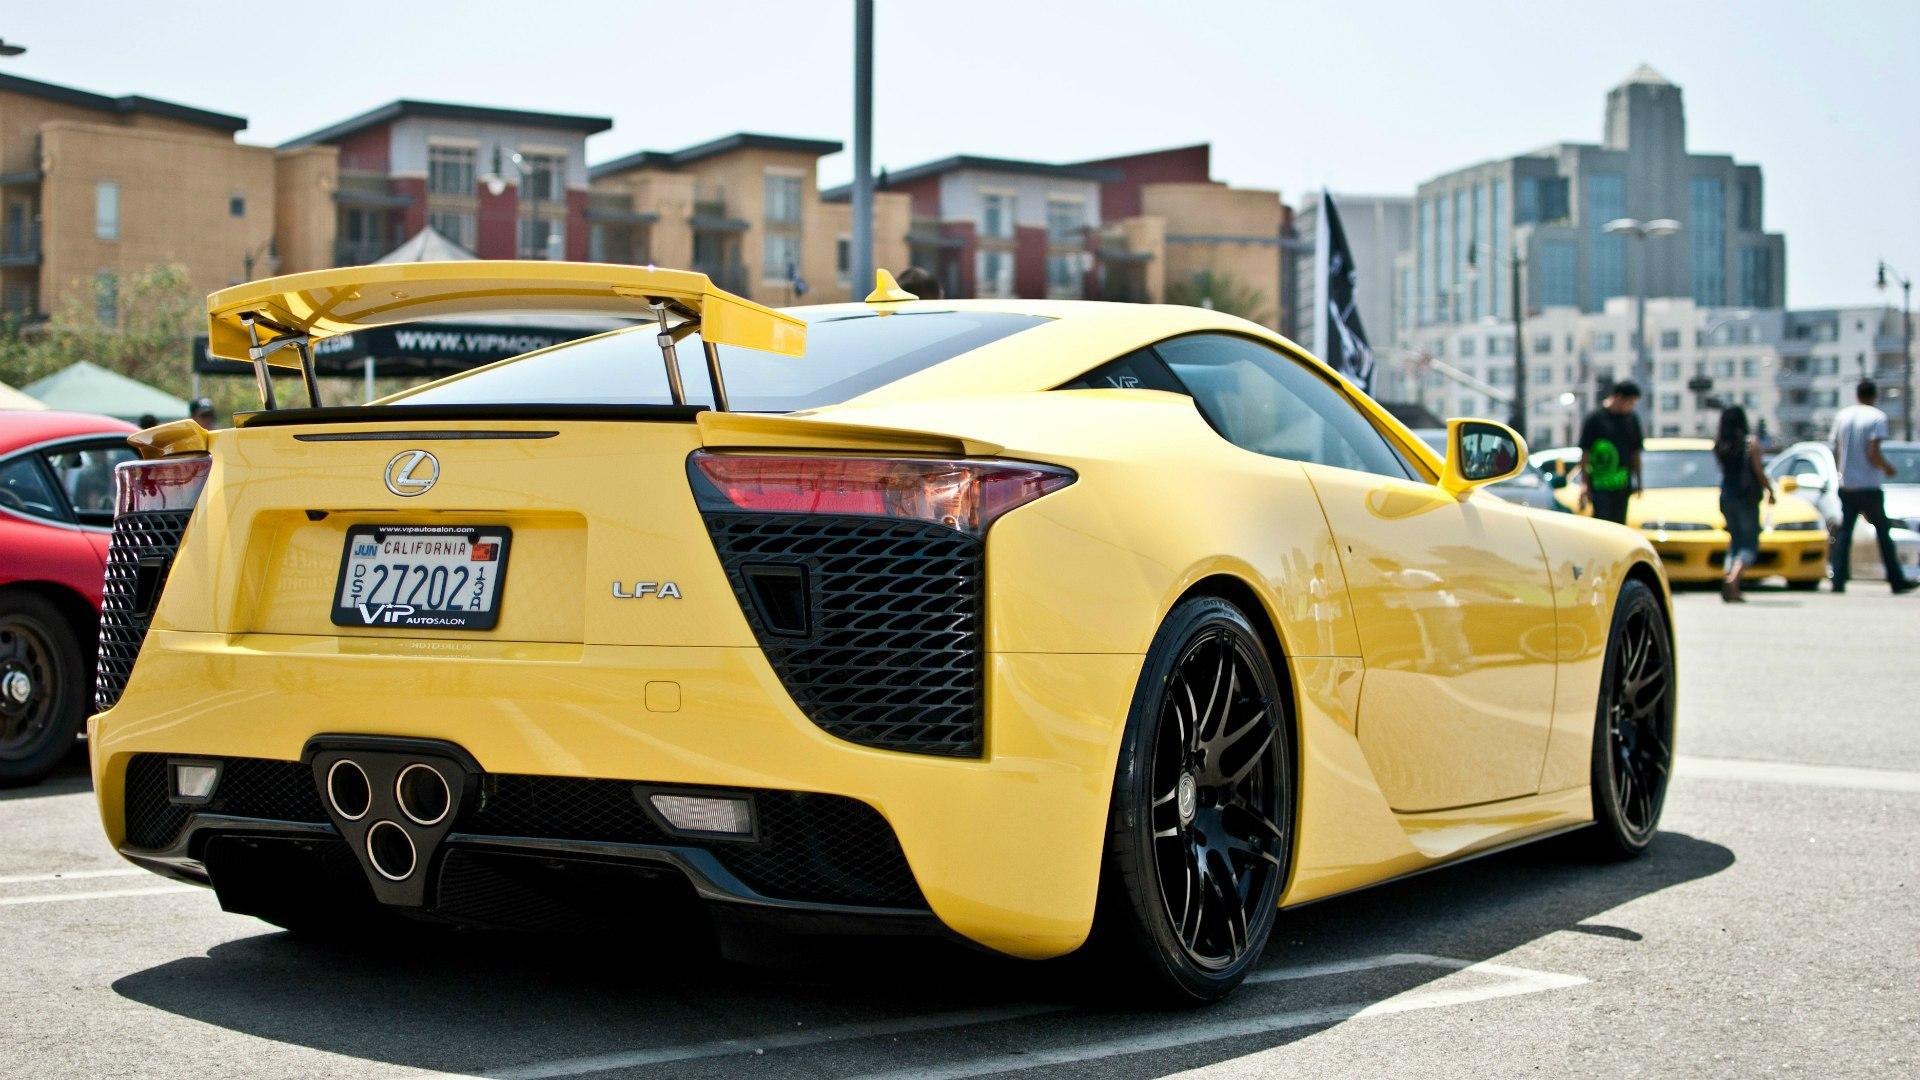 yellow car 2015 09 - photo #11